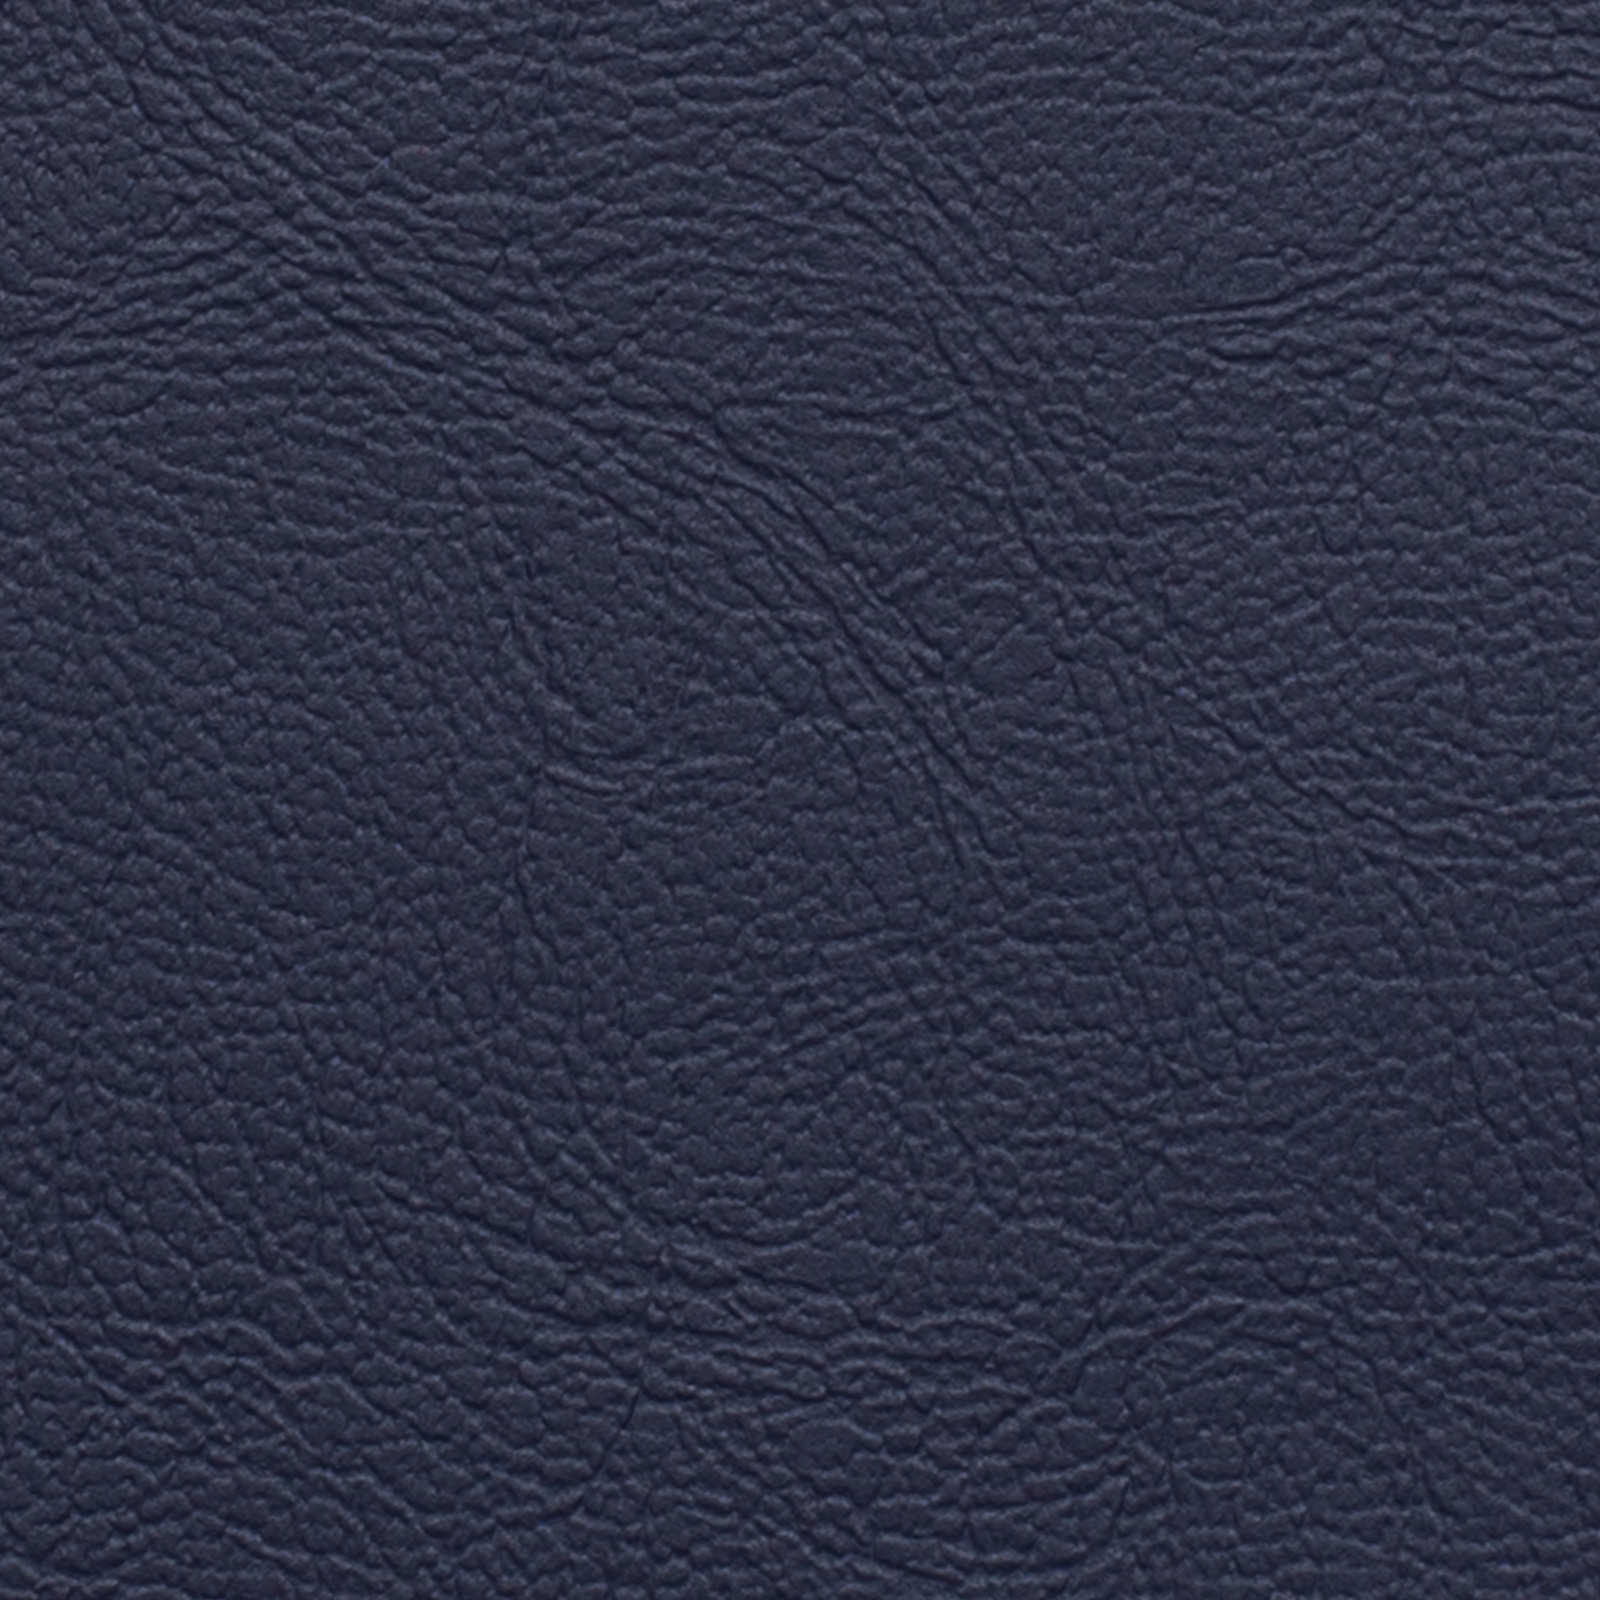 Navy Moonscape